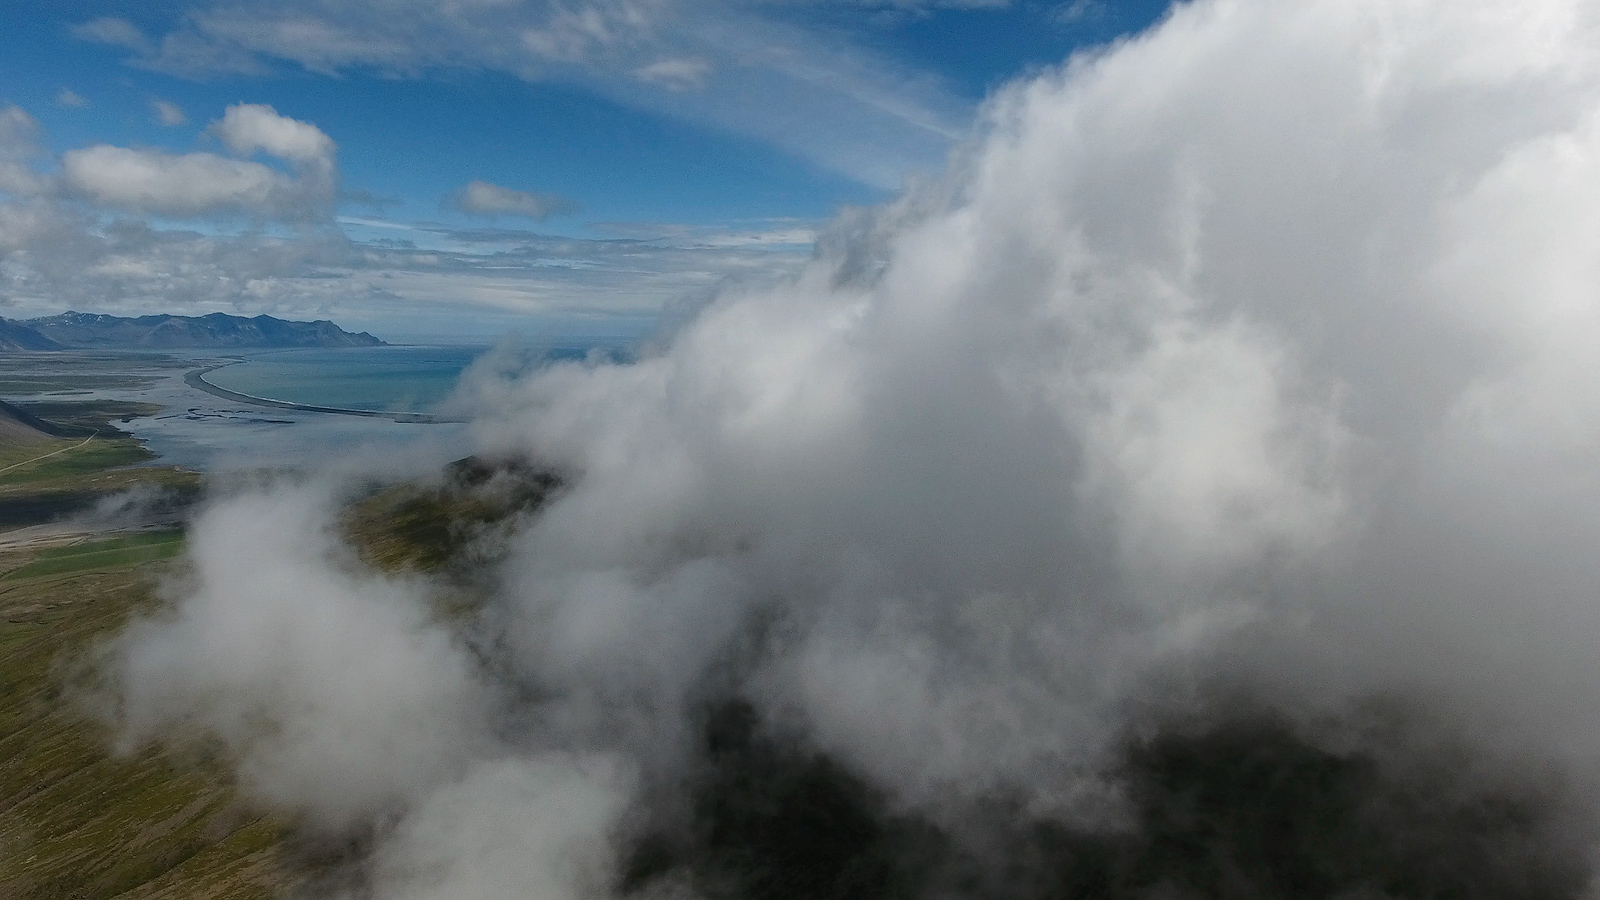 Iceland, ocean, aerial, drone, phantom 4, DJI, Bernard Chen, photo